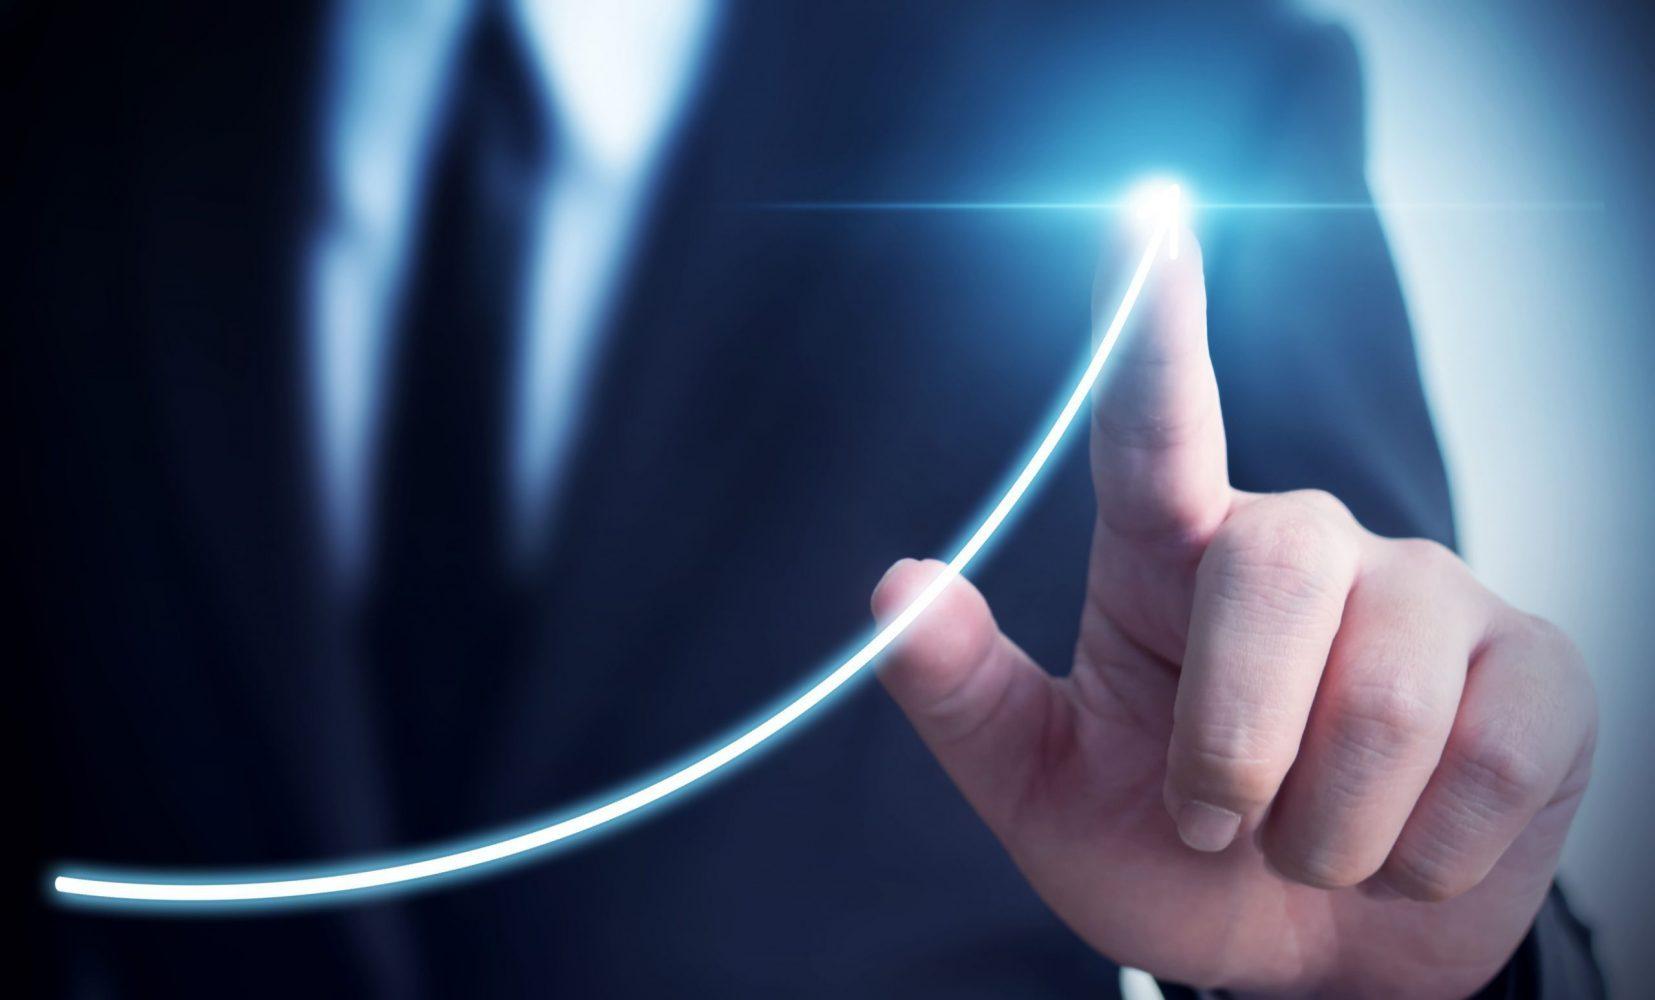 https://mjmeurope.com/media/2020/07/Business-Strategy-Image2-overlay-min-scaled-e1595345729906.jpg